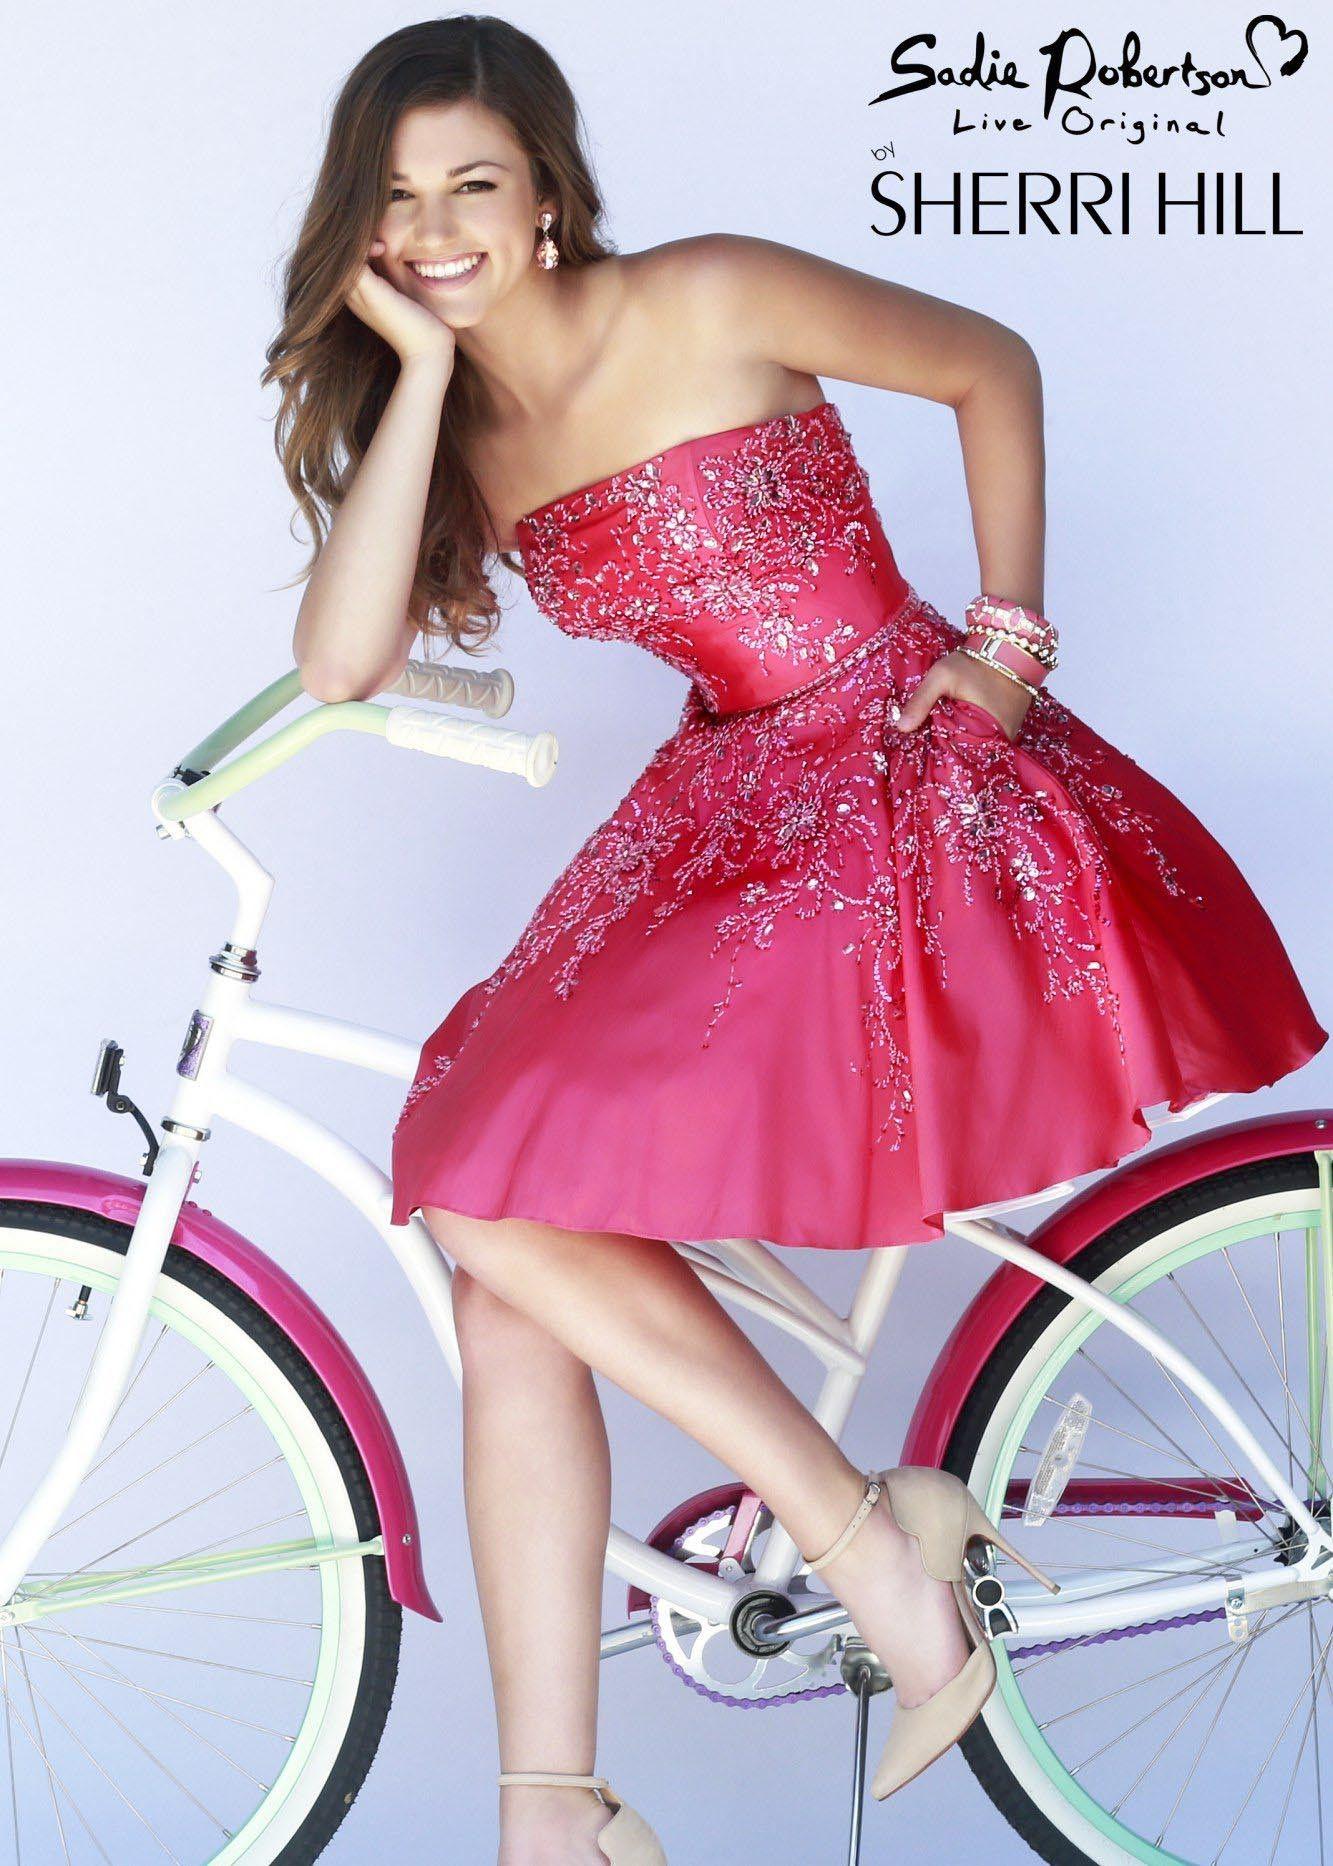 sadie robertson prom dresses | Dresses | Pinterest | Sadie robertson ...